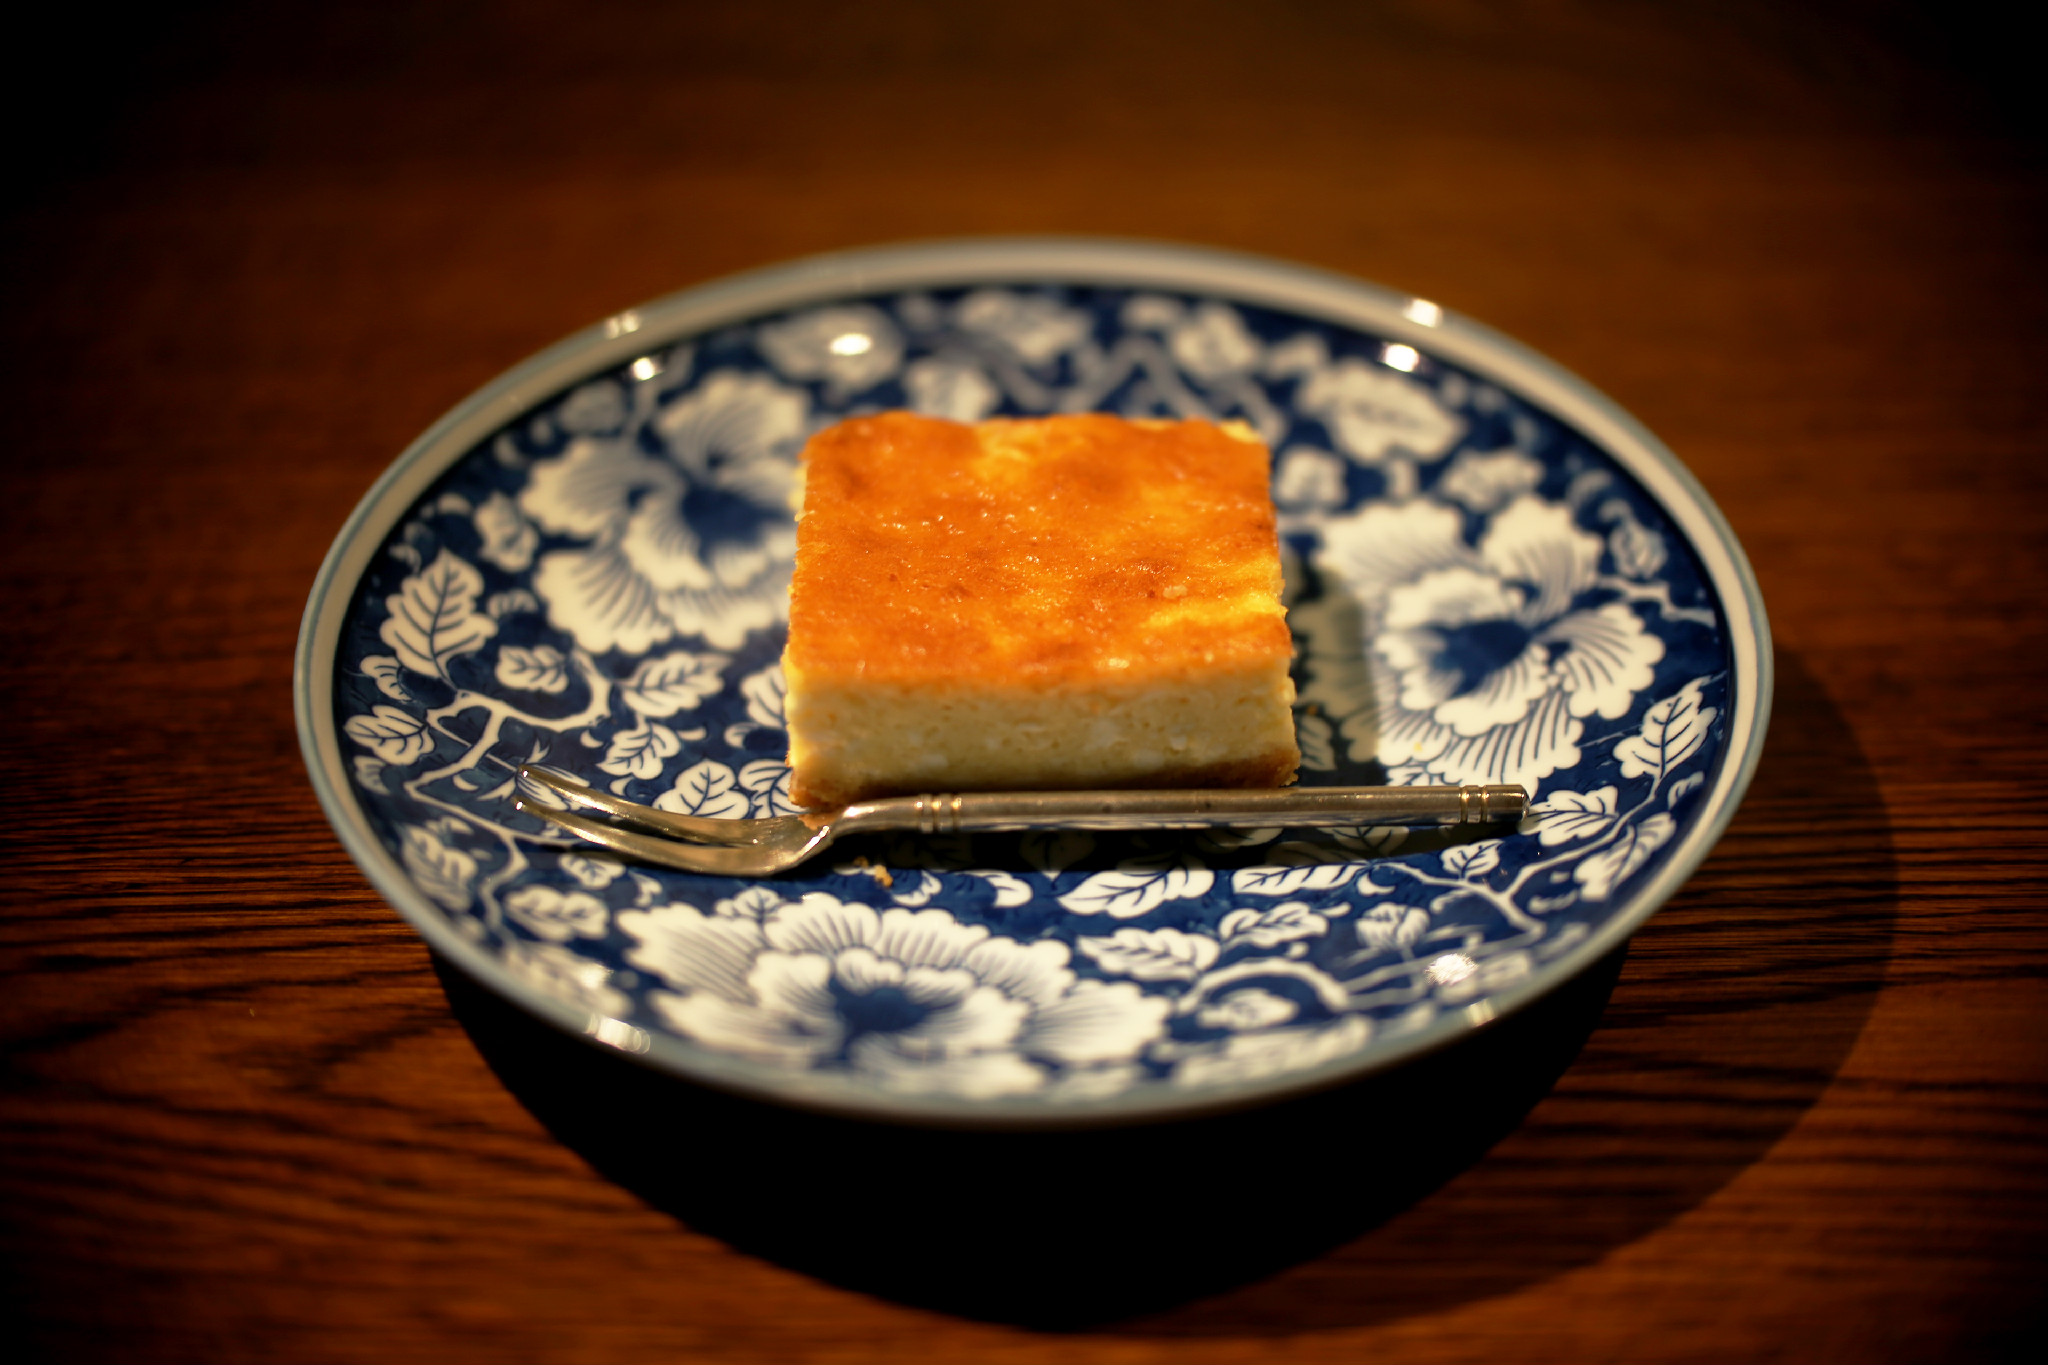 TODAYS SWEET'S_BAKED CHEESE CAKE_Viamver Yeast used